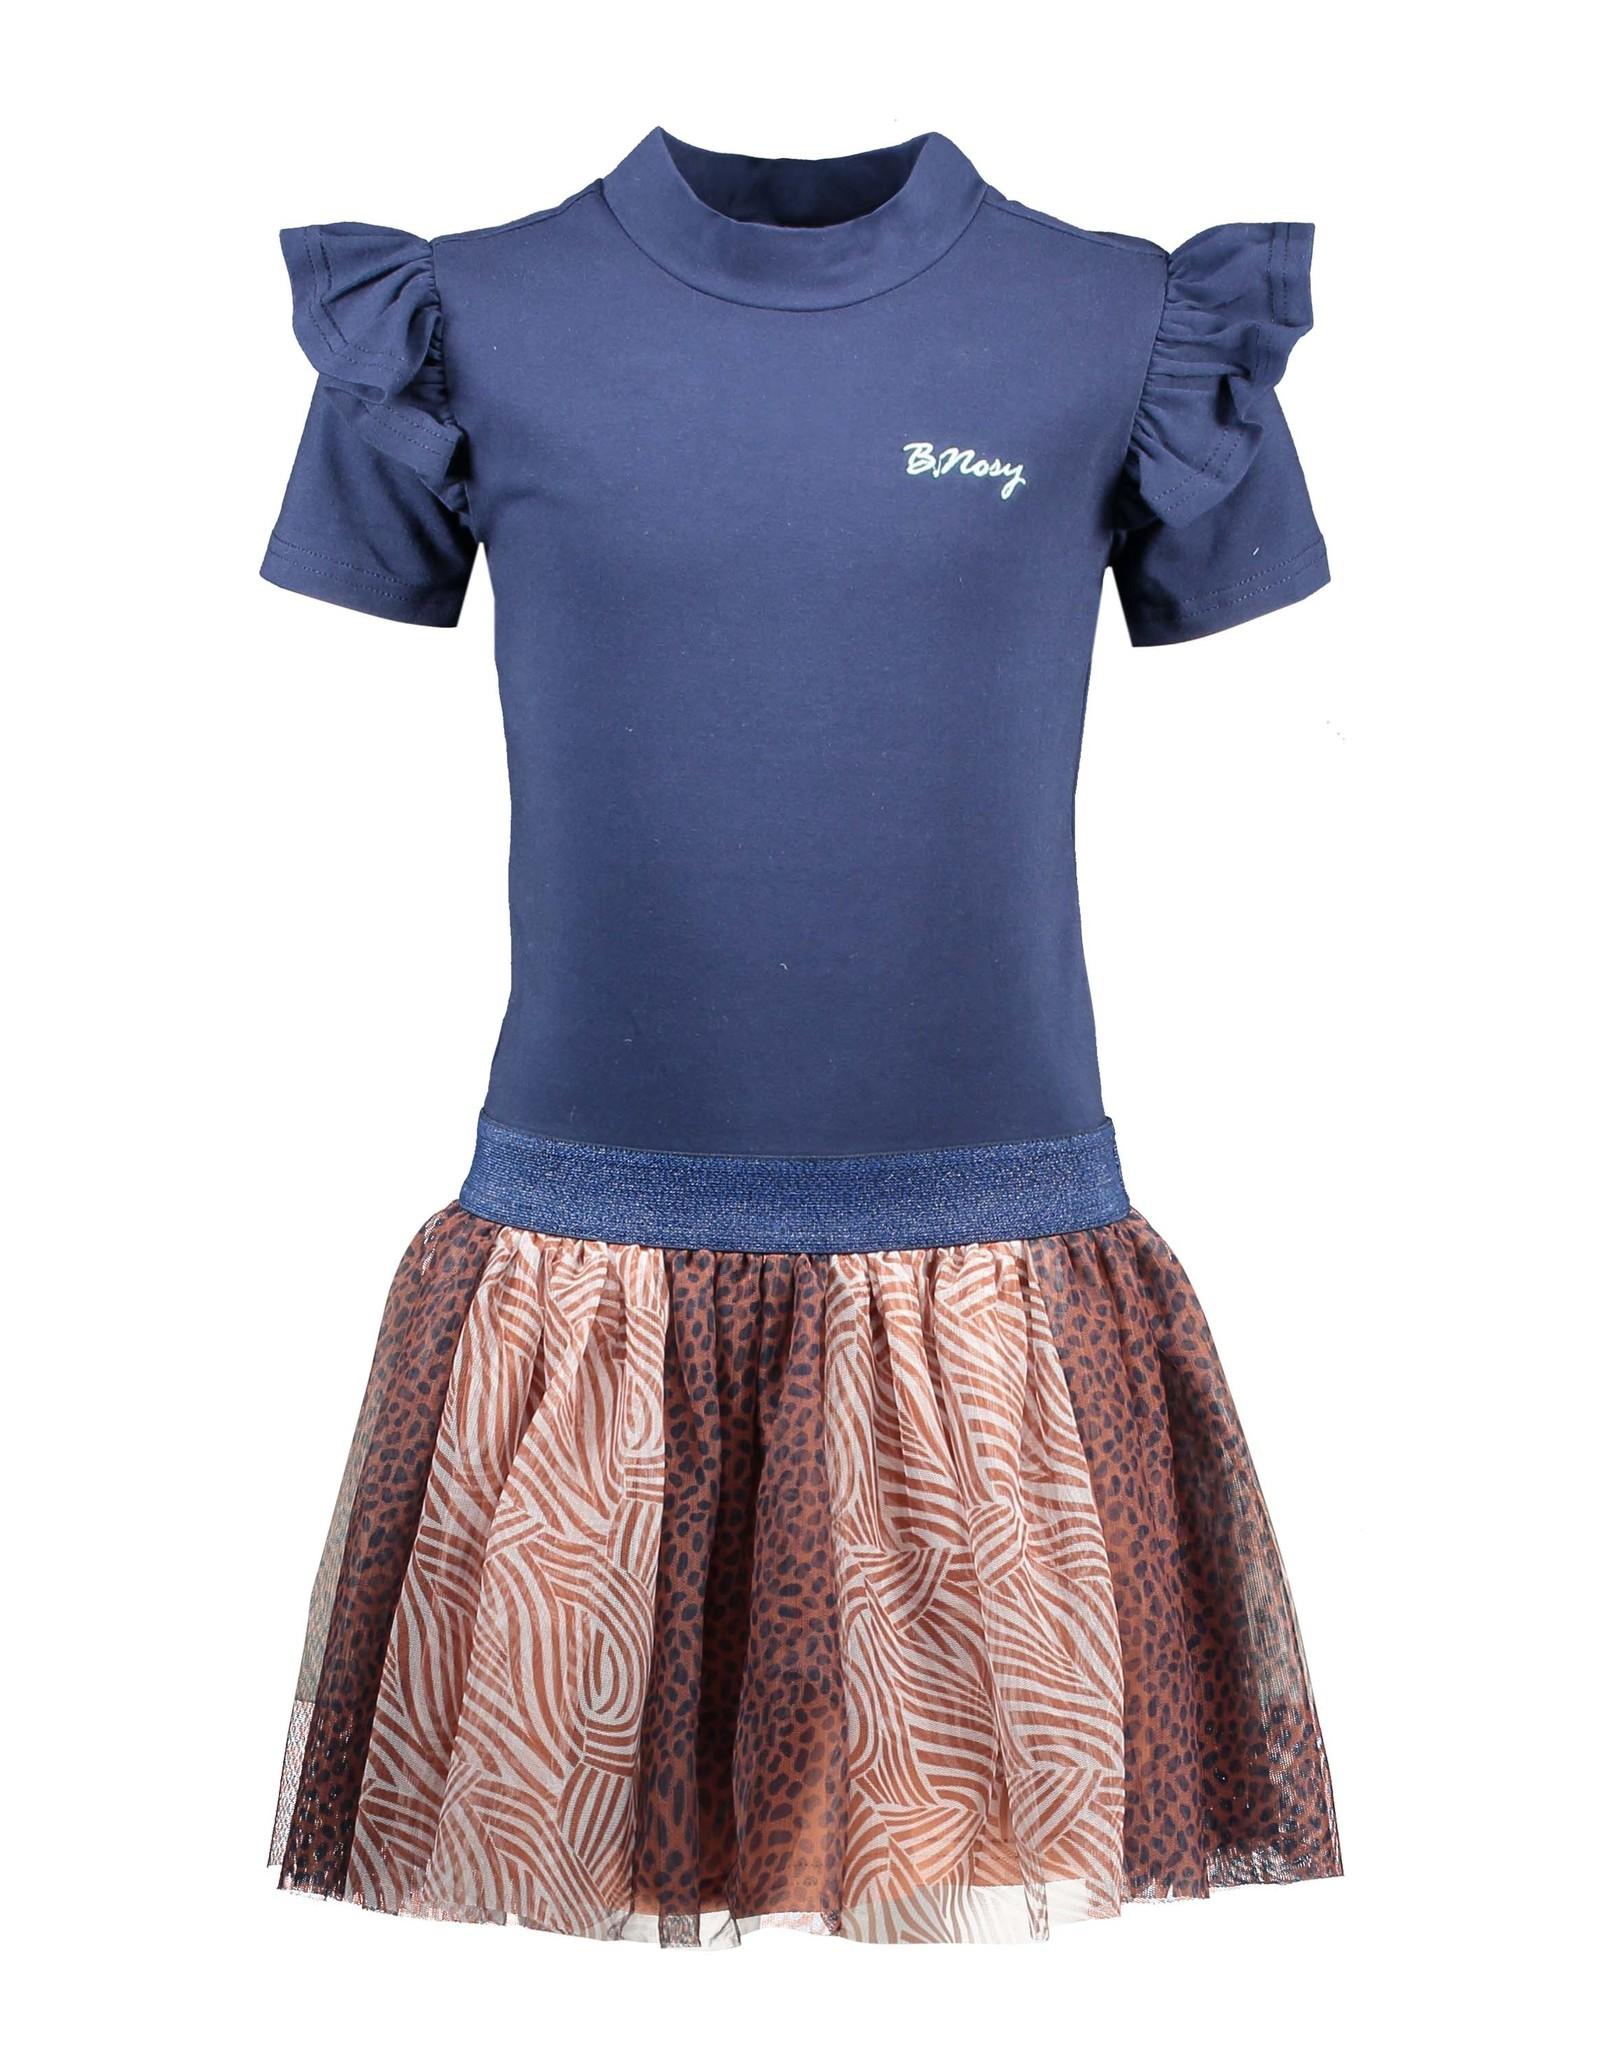 B-Nosy Girls dress with aop mesh skirt, space blue